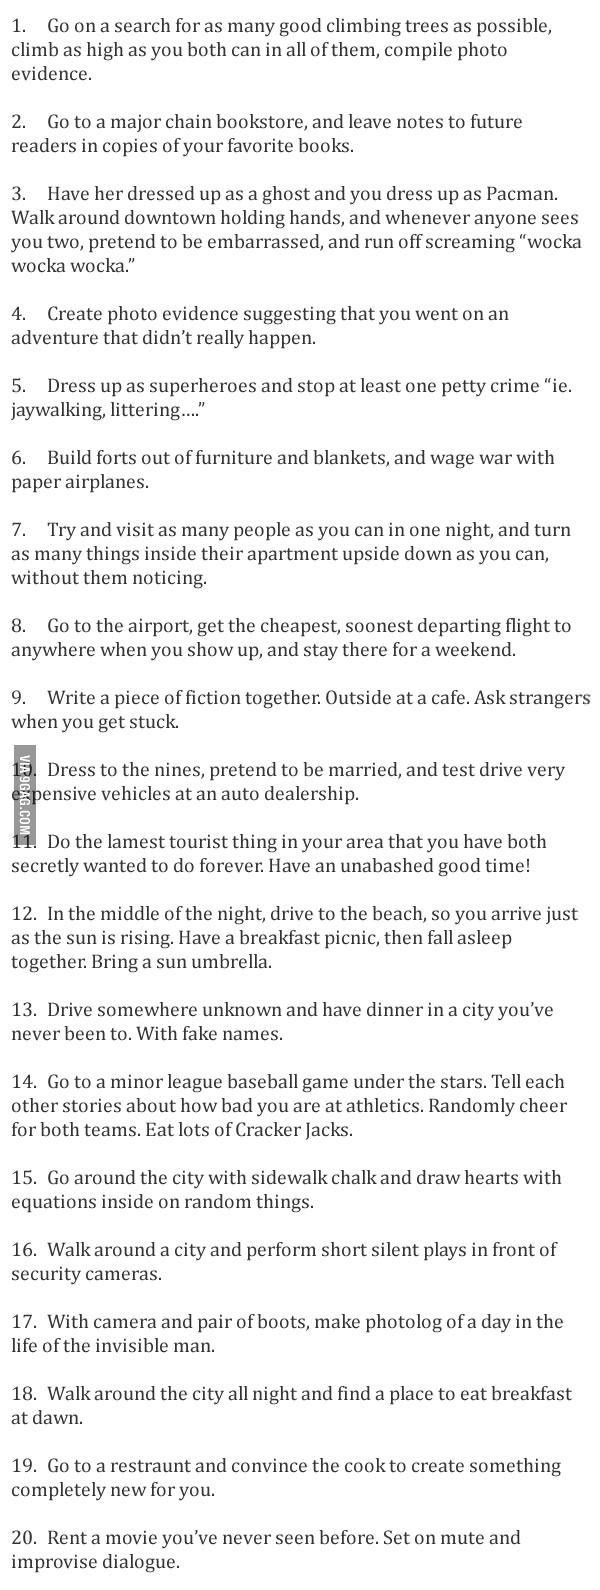 Unusual (and fun!) Date Ideas